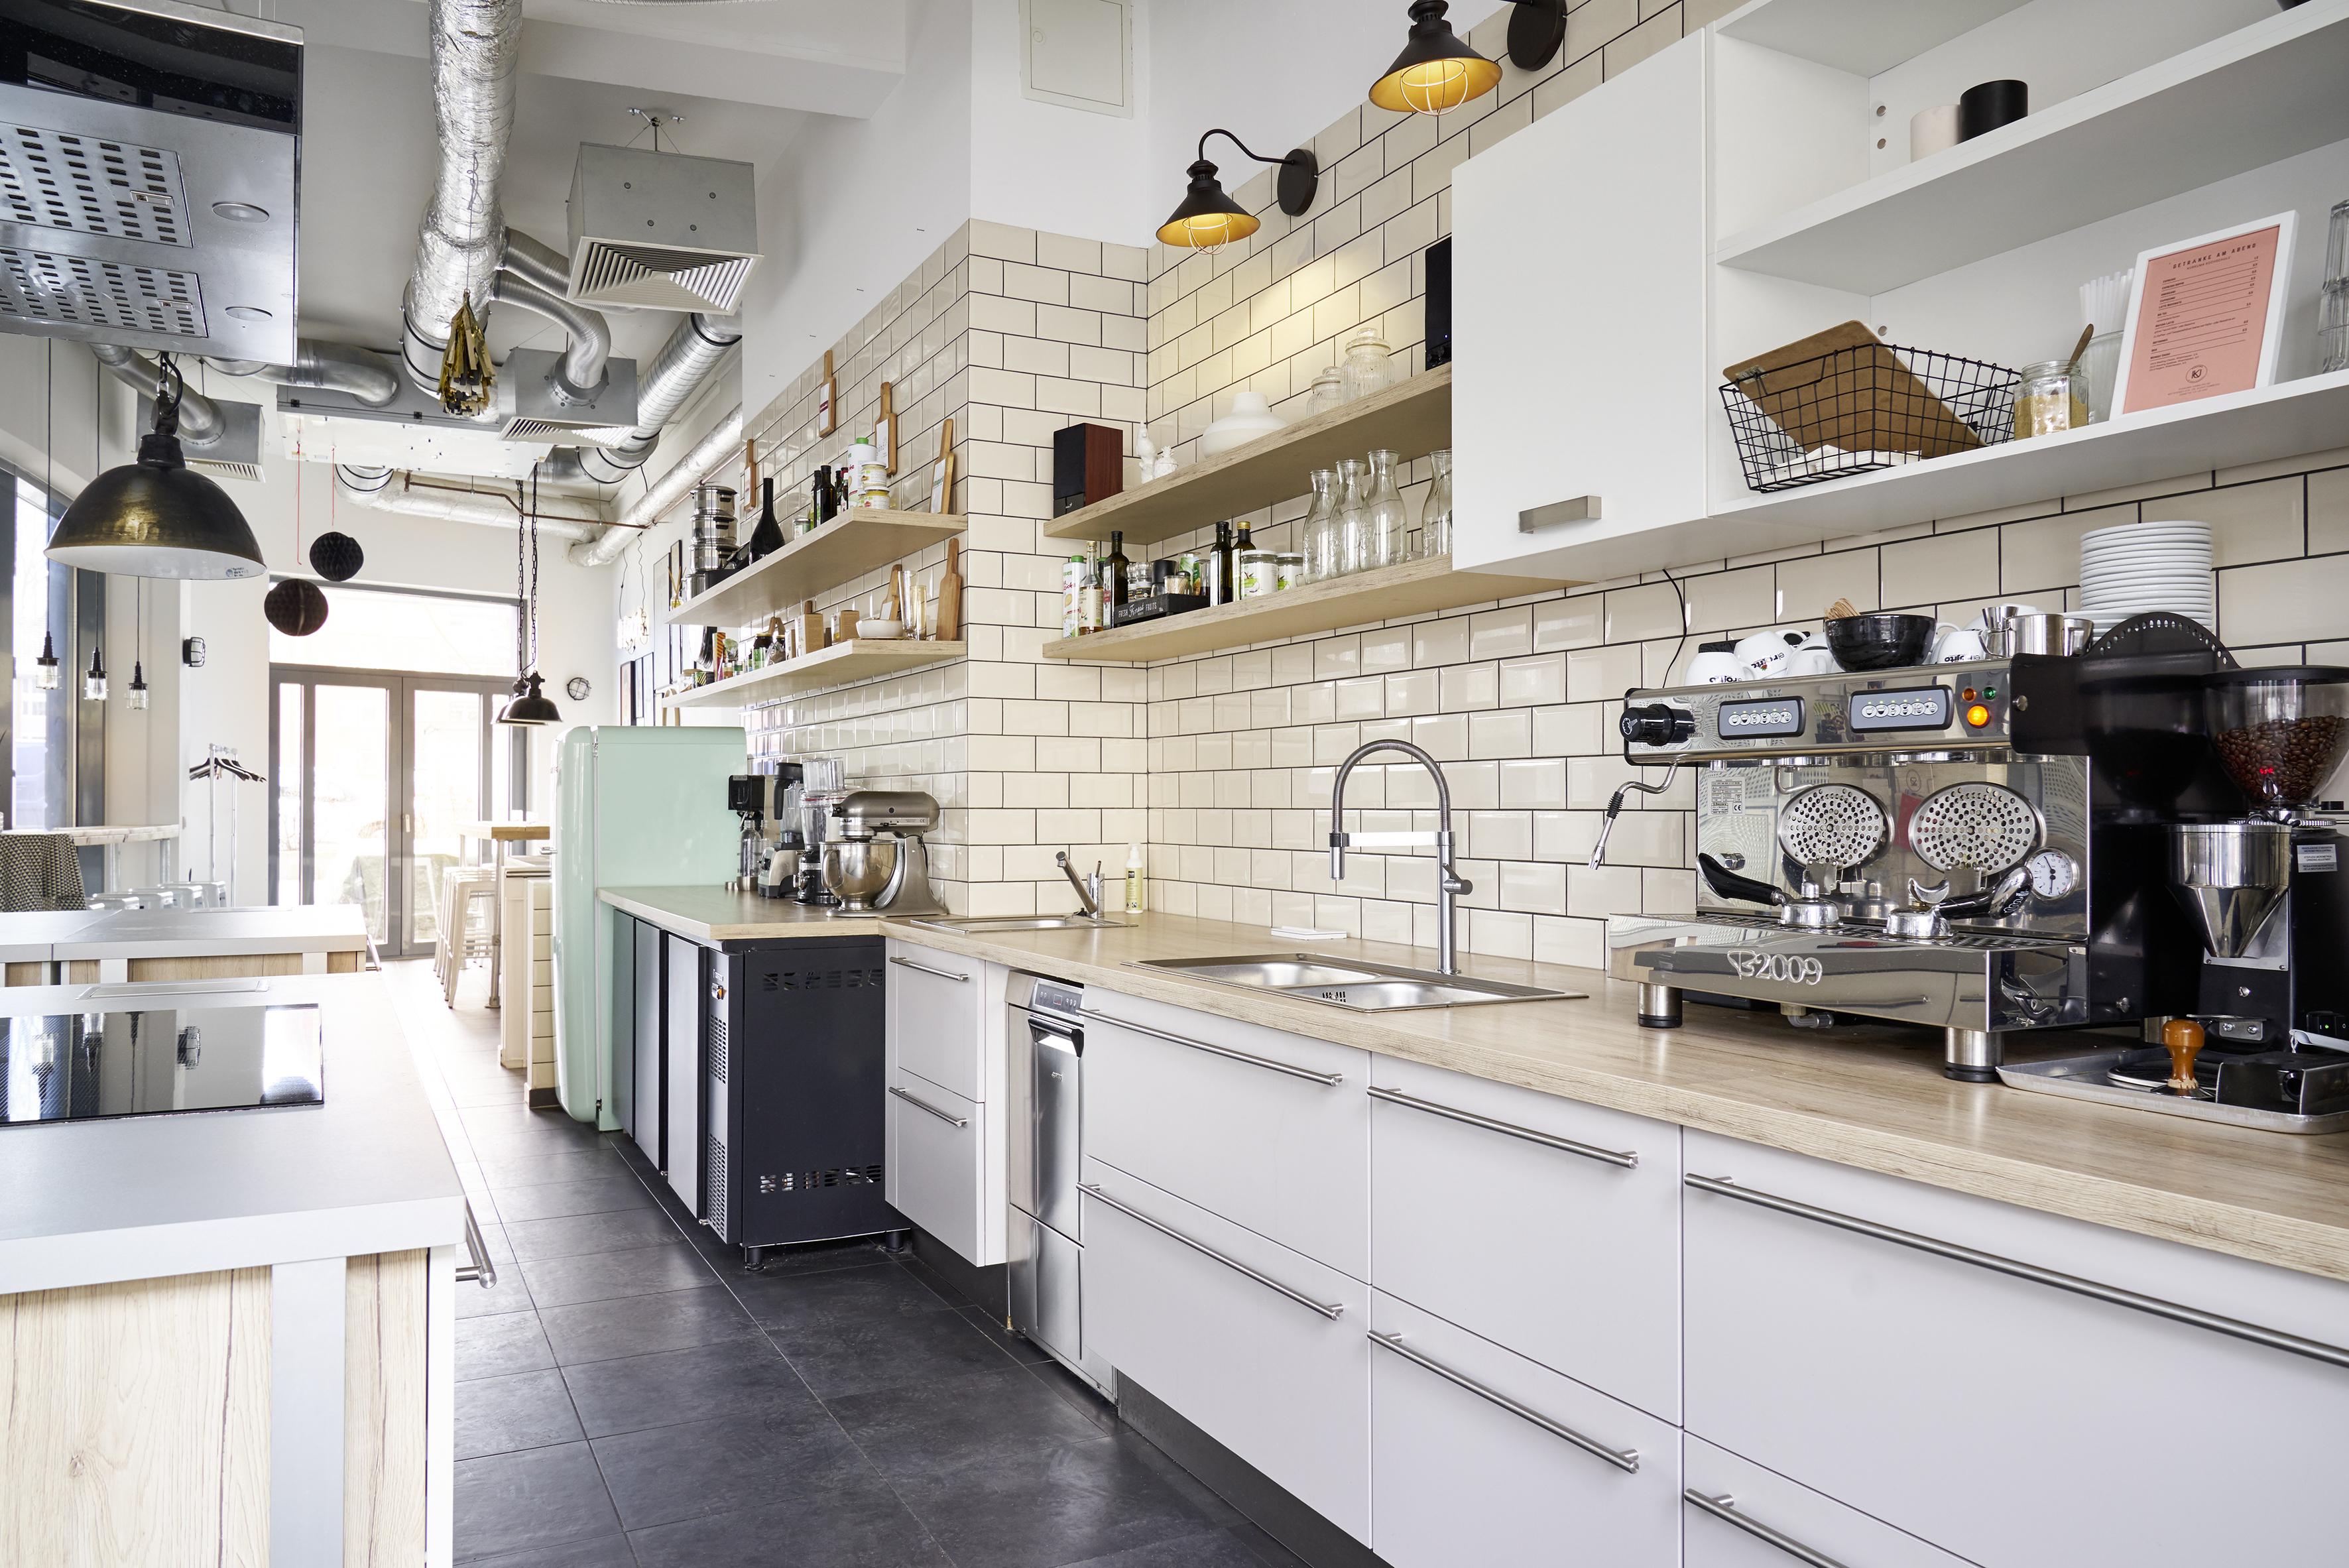 kurkuma mieten in hamburg. Black Bedroom Furniture Sets. Home Design Ideas